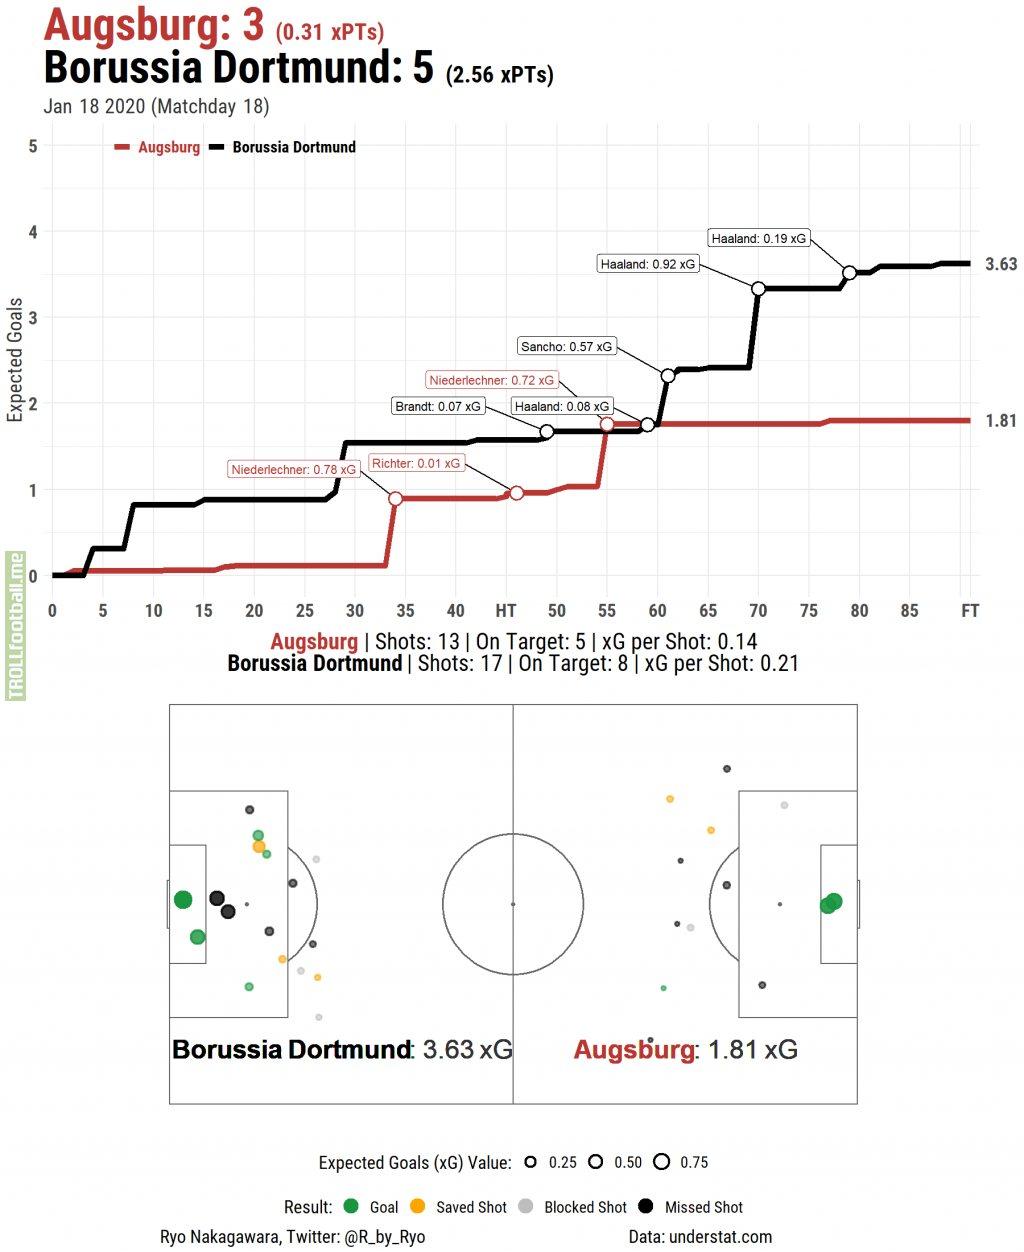 [OC] xG Timeline & Shot Map for FC Augsburg [3] - [5] Borussia Dortmund (January 18th, 2020)